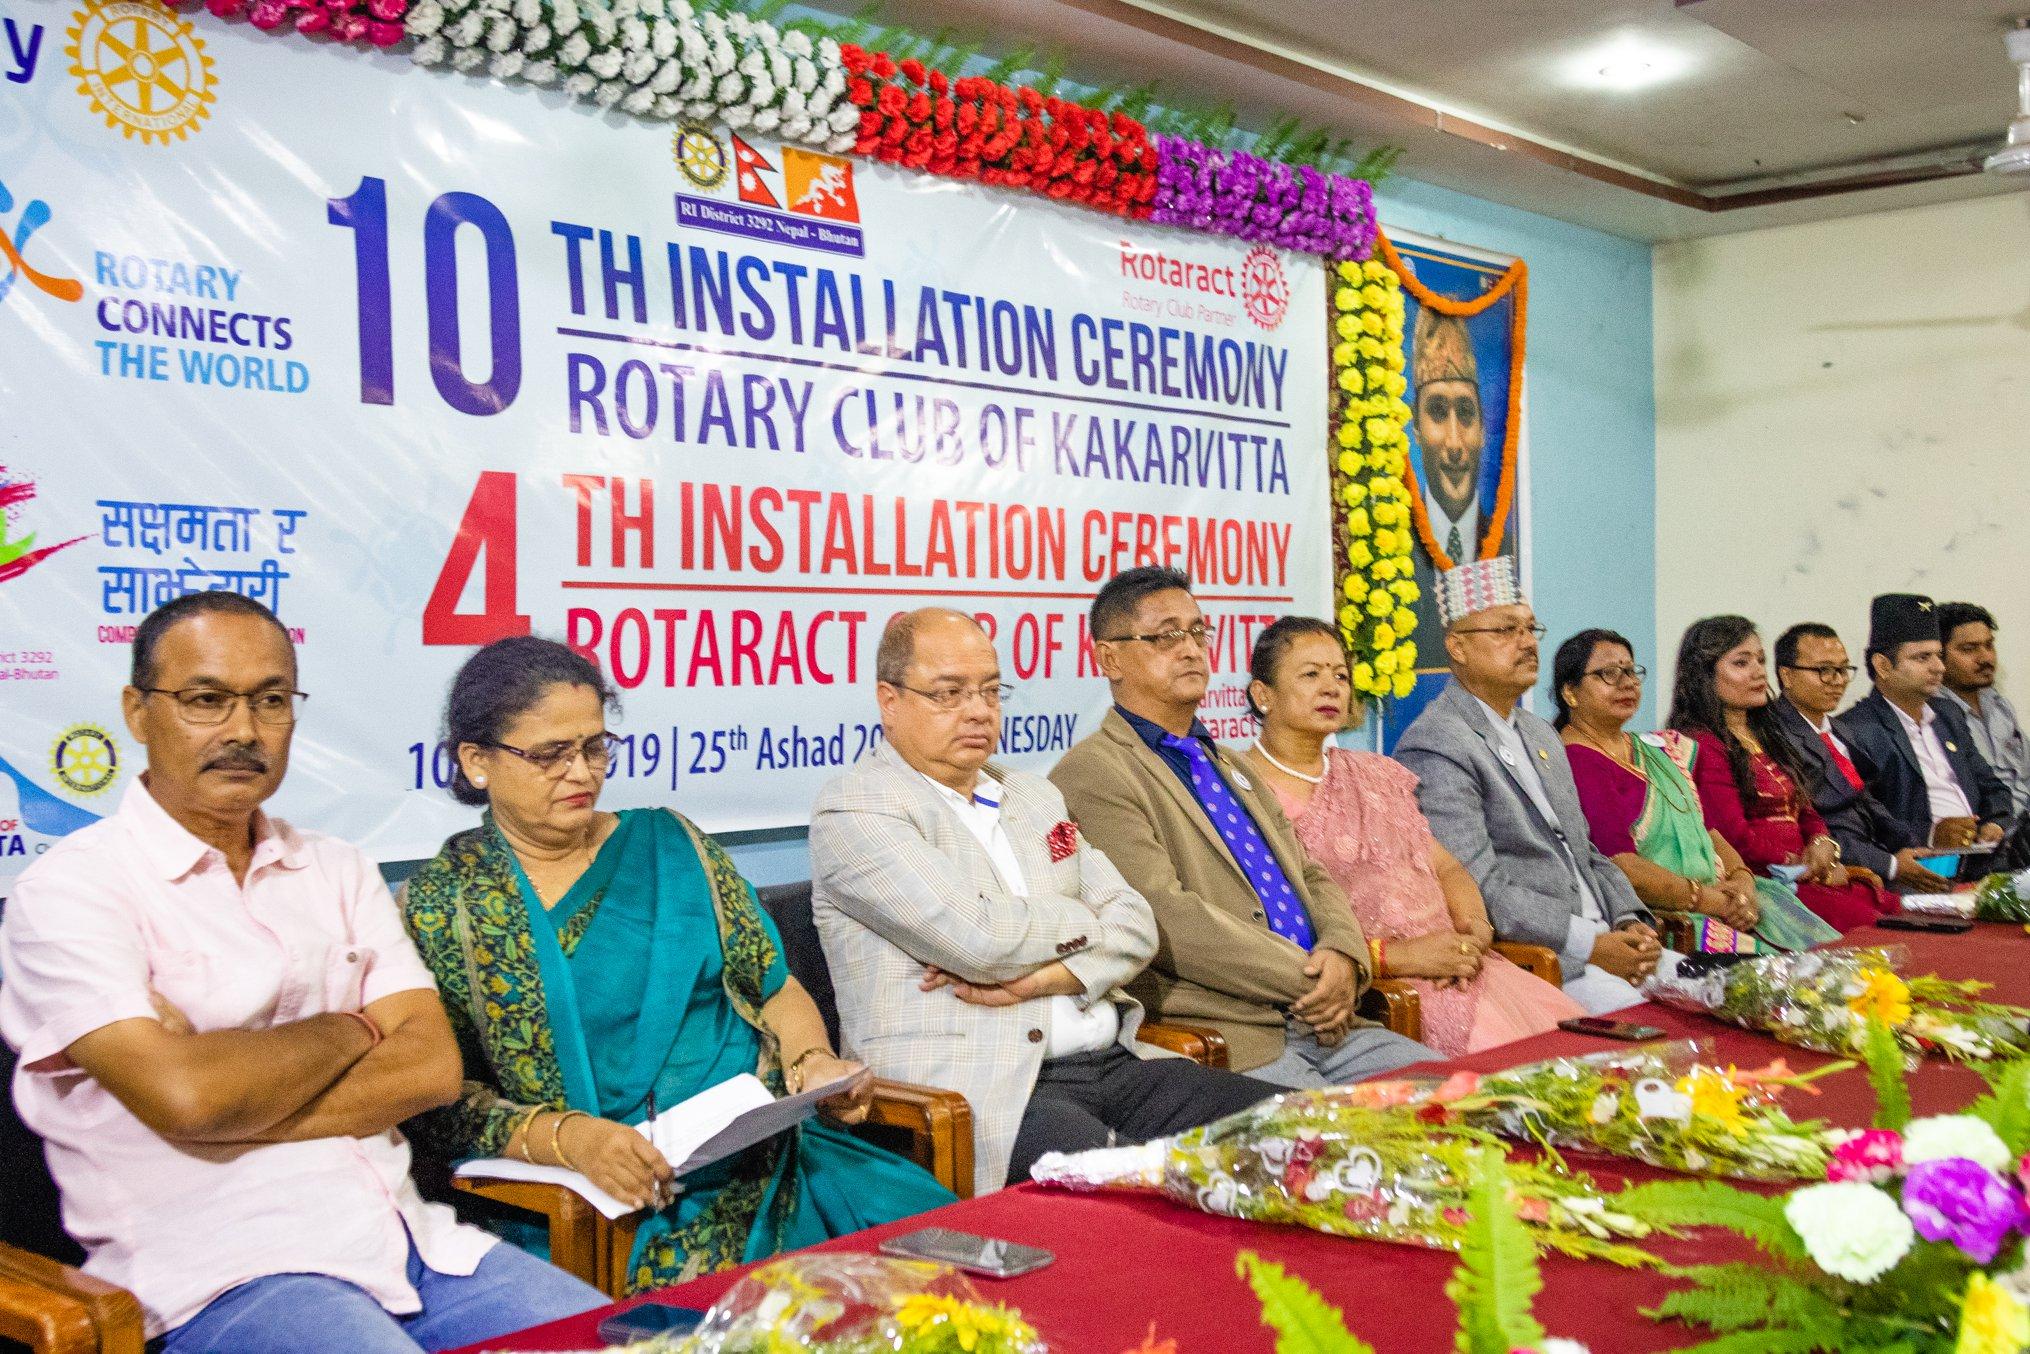 10th Installation Ceremony Rotary Club Of Kakarvitta 4